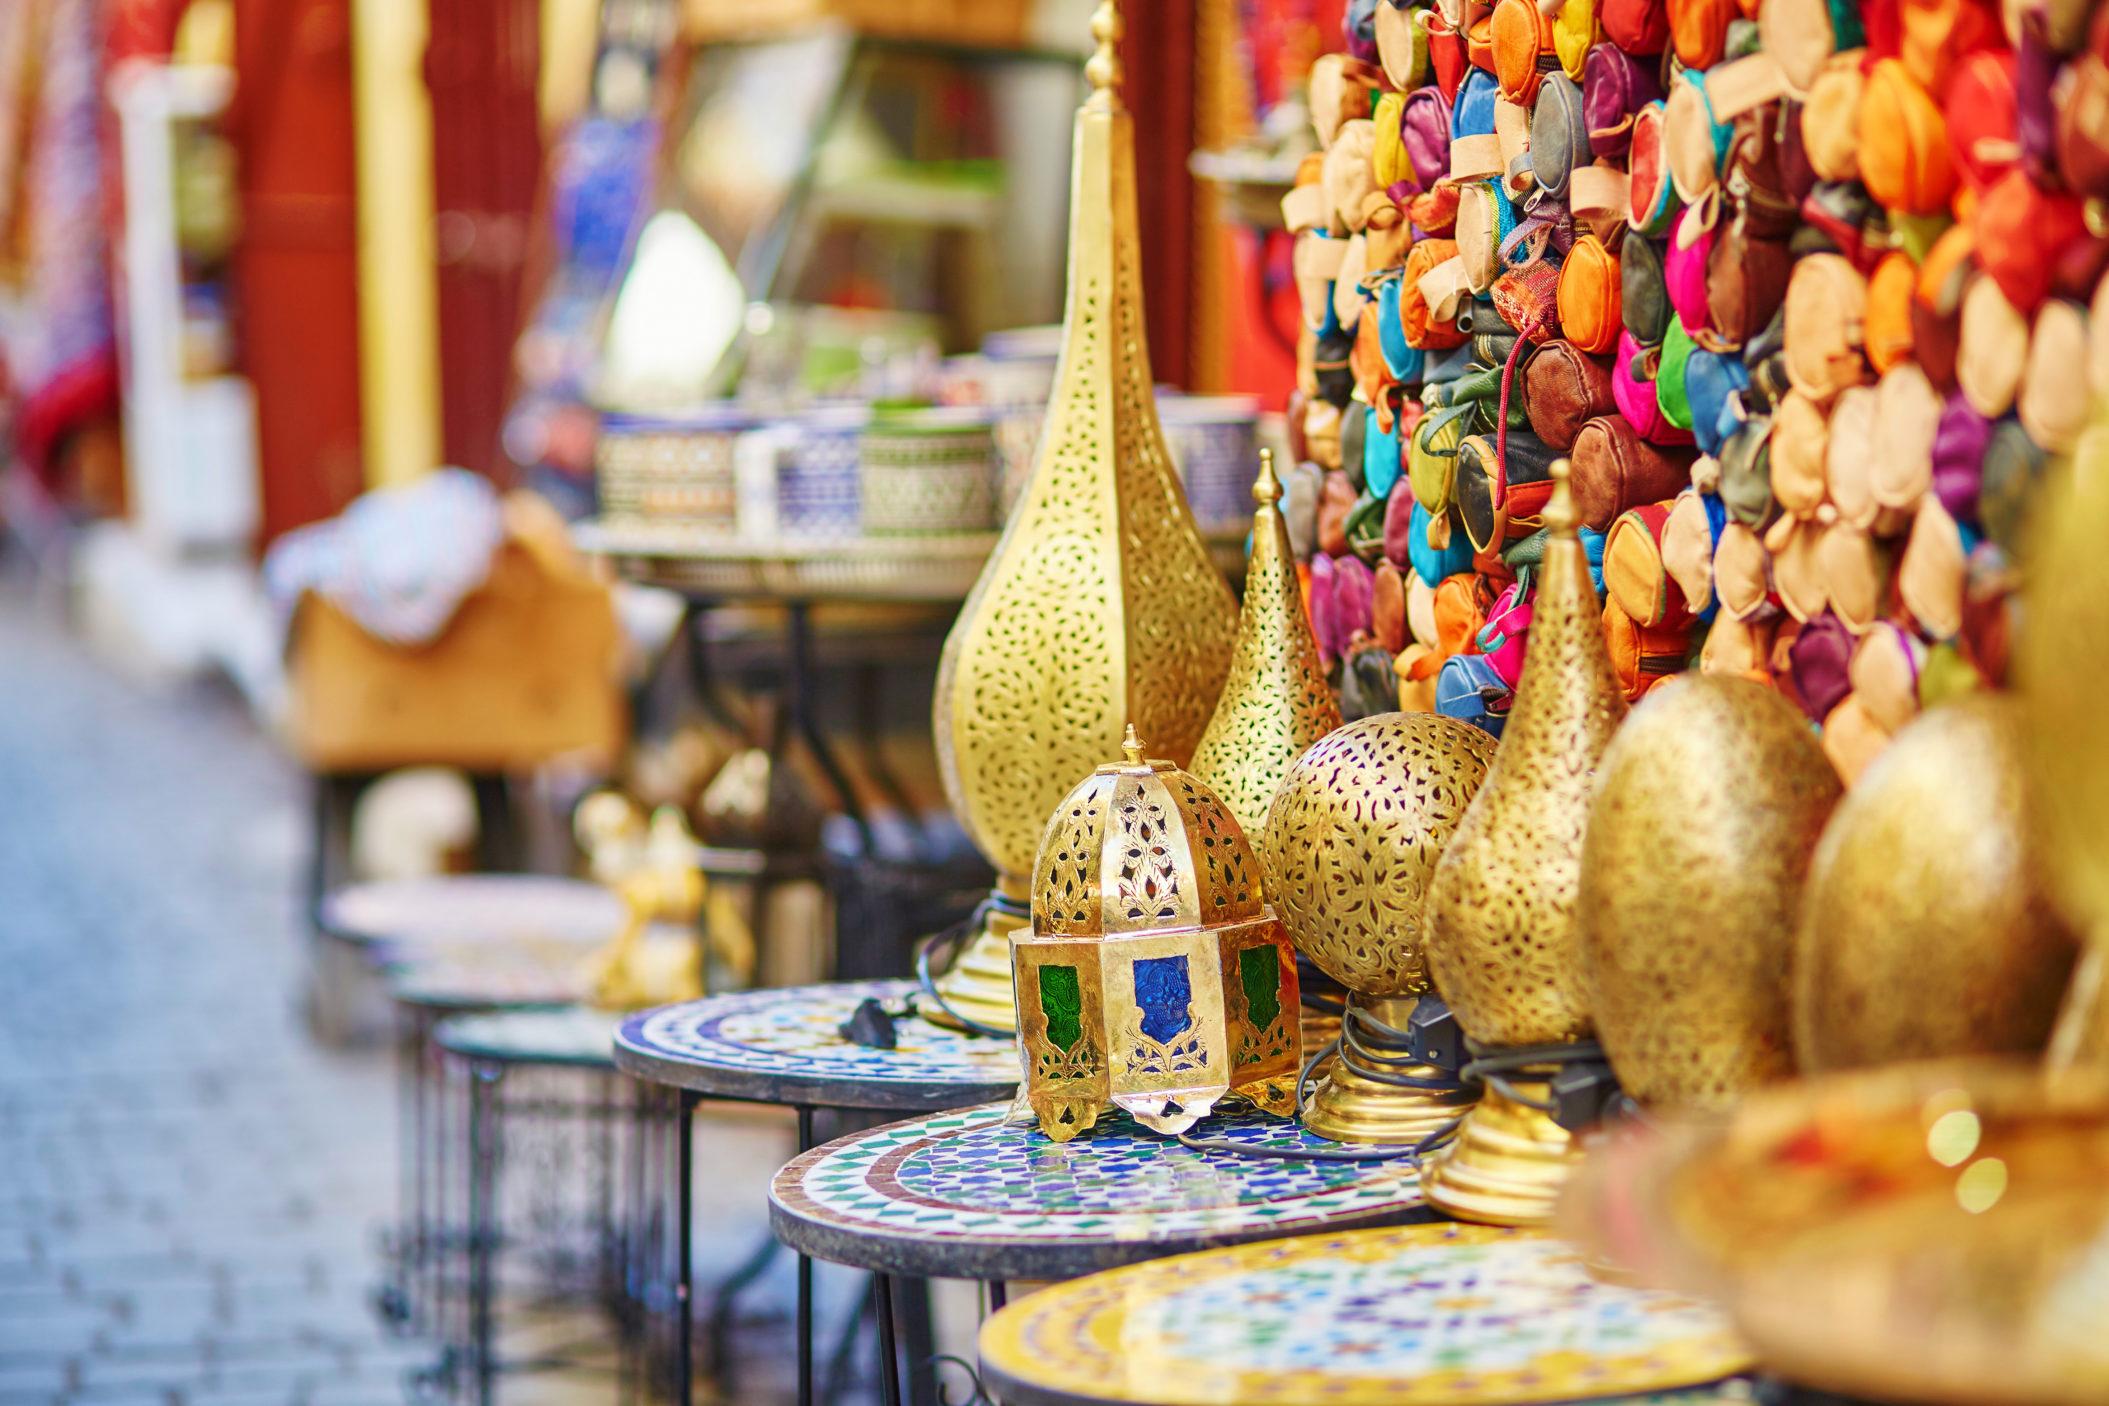 Morocco [Shutterstock]